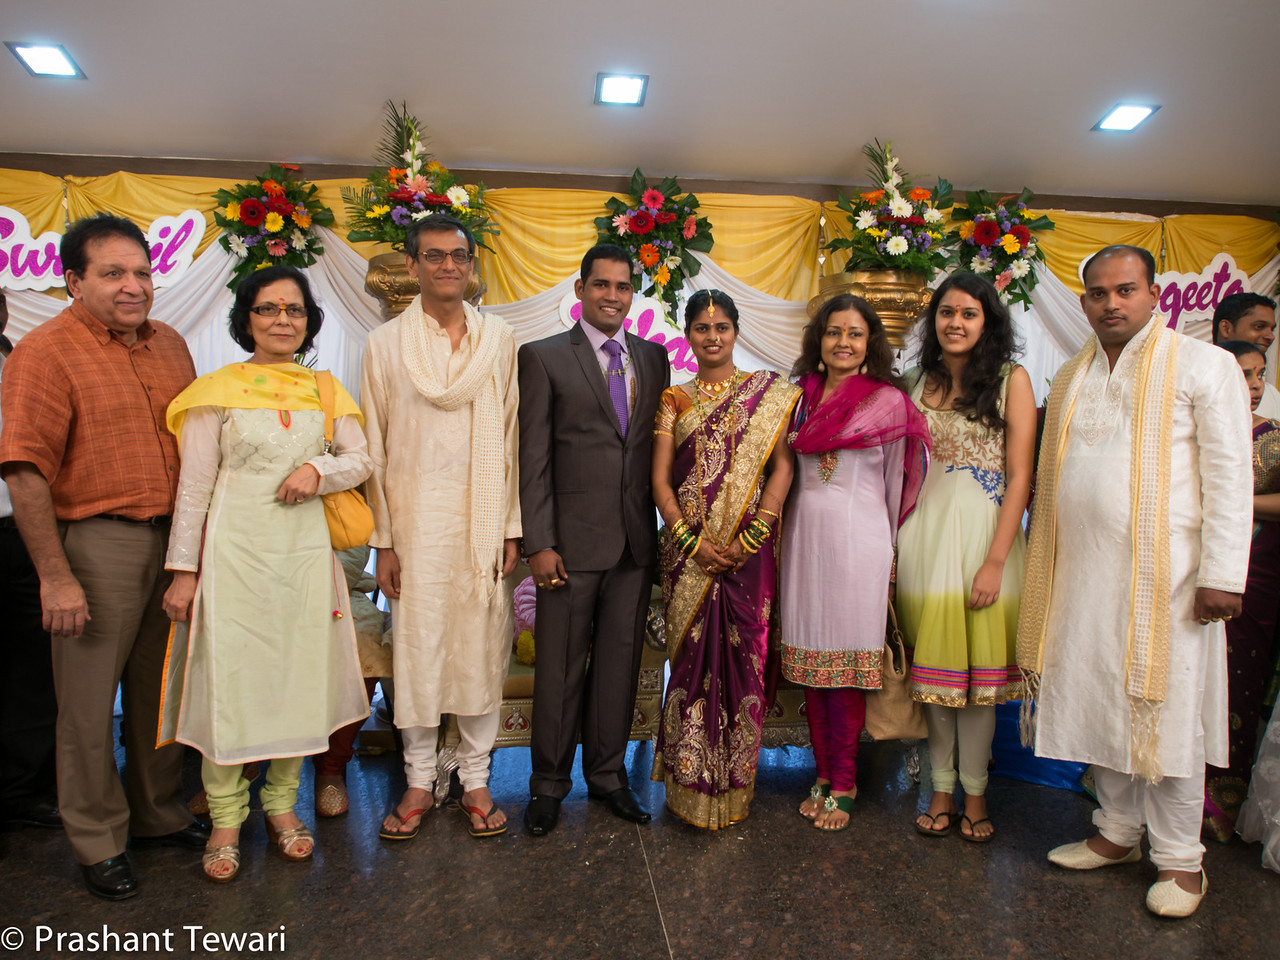 Swapnil's Wedding